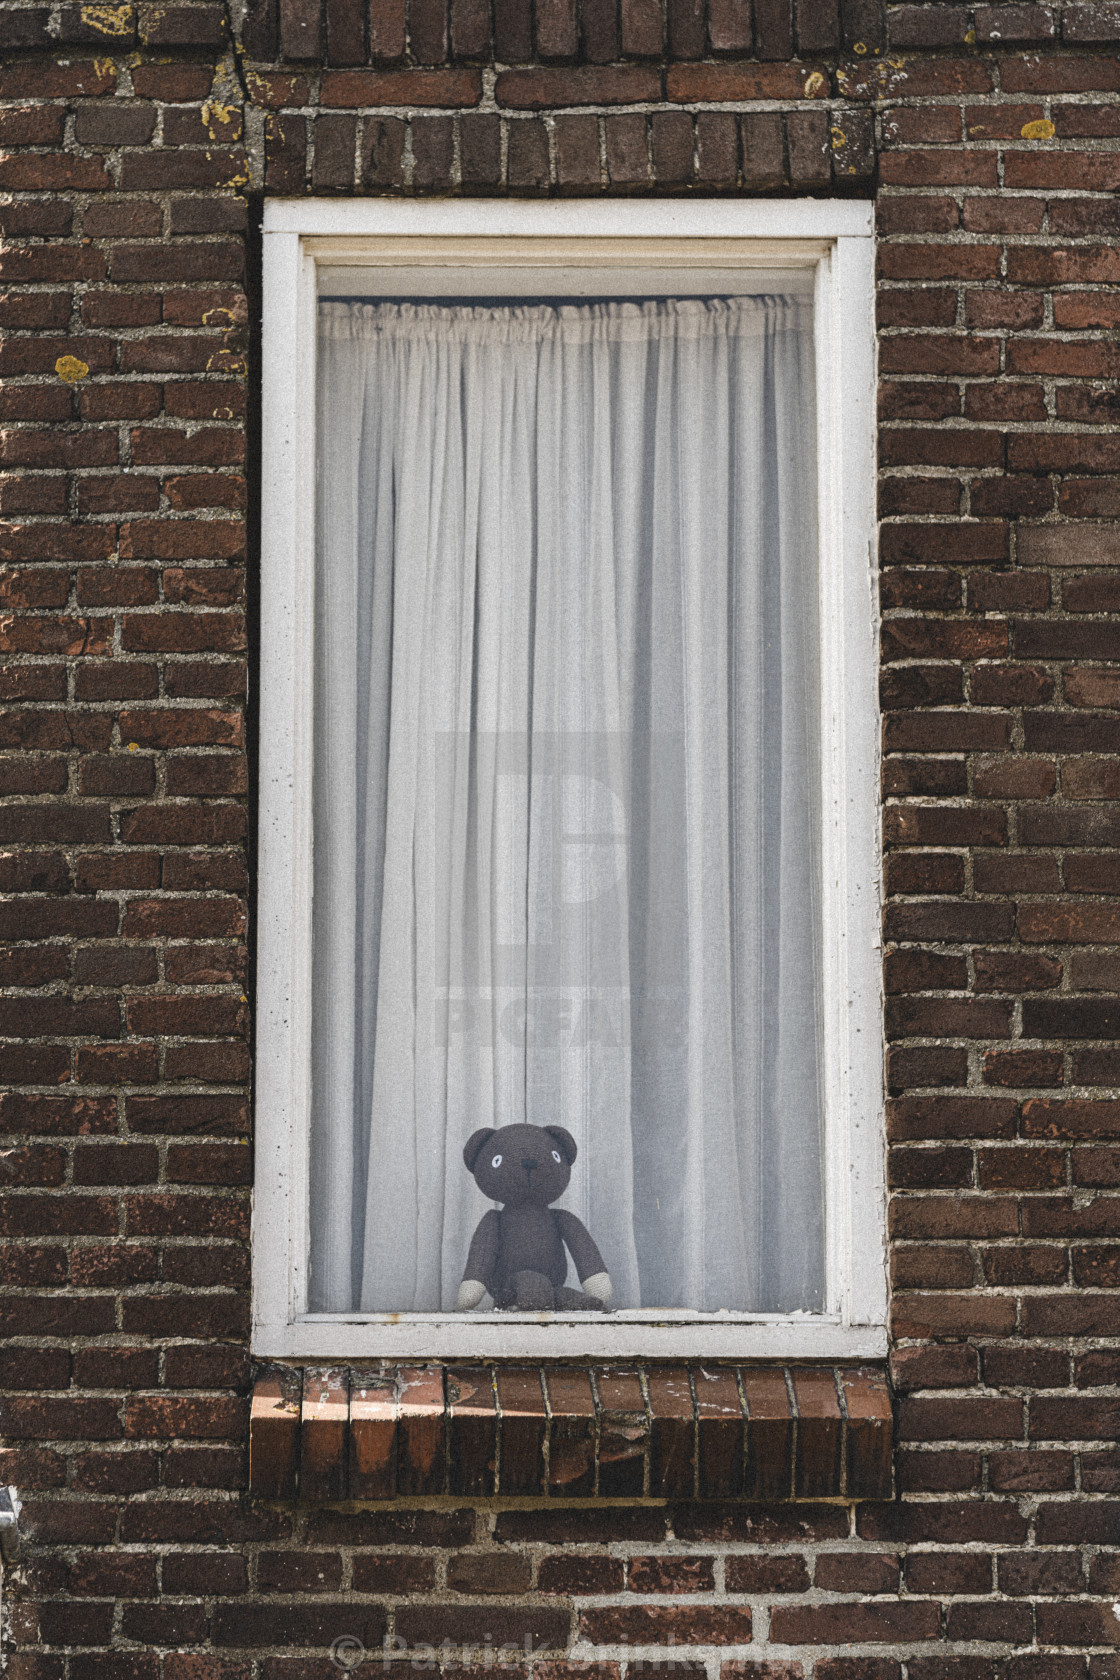 """Teddy bear in a window in a brick wall"" stock image"